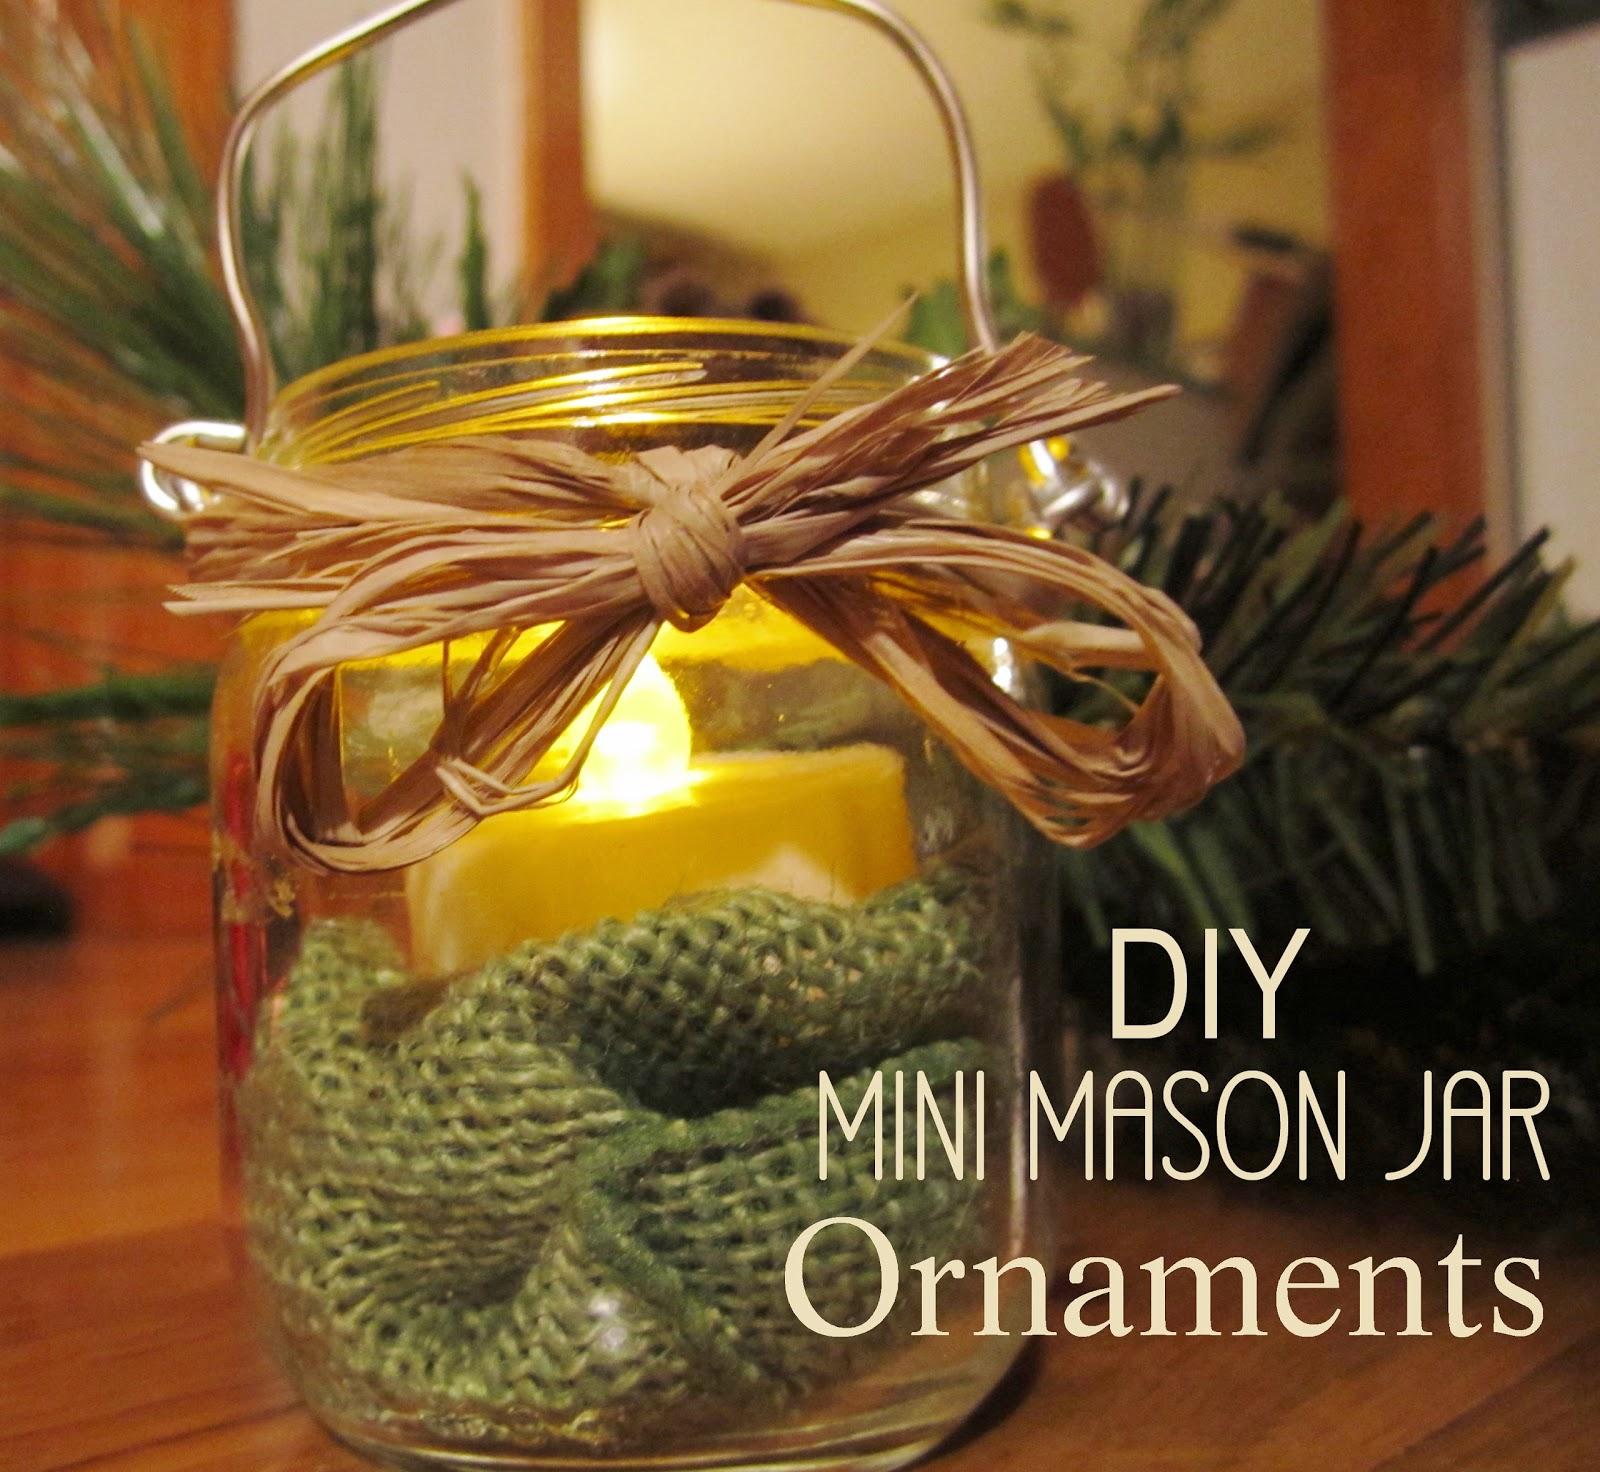 Mason jar ornaments - Diy Mini Mason Jar Ornaments